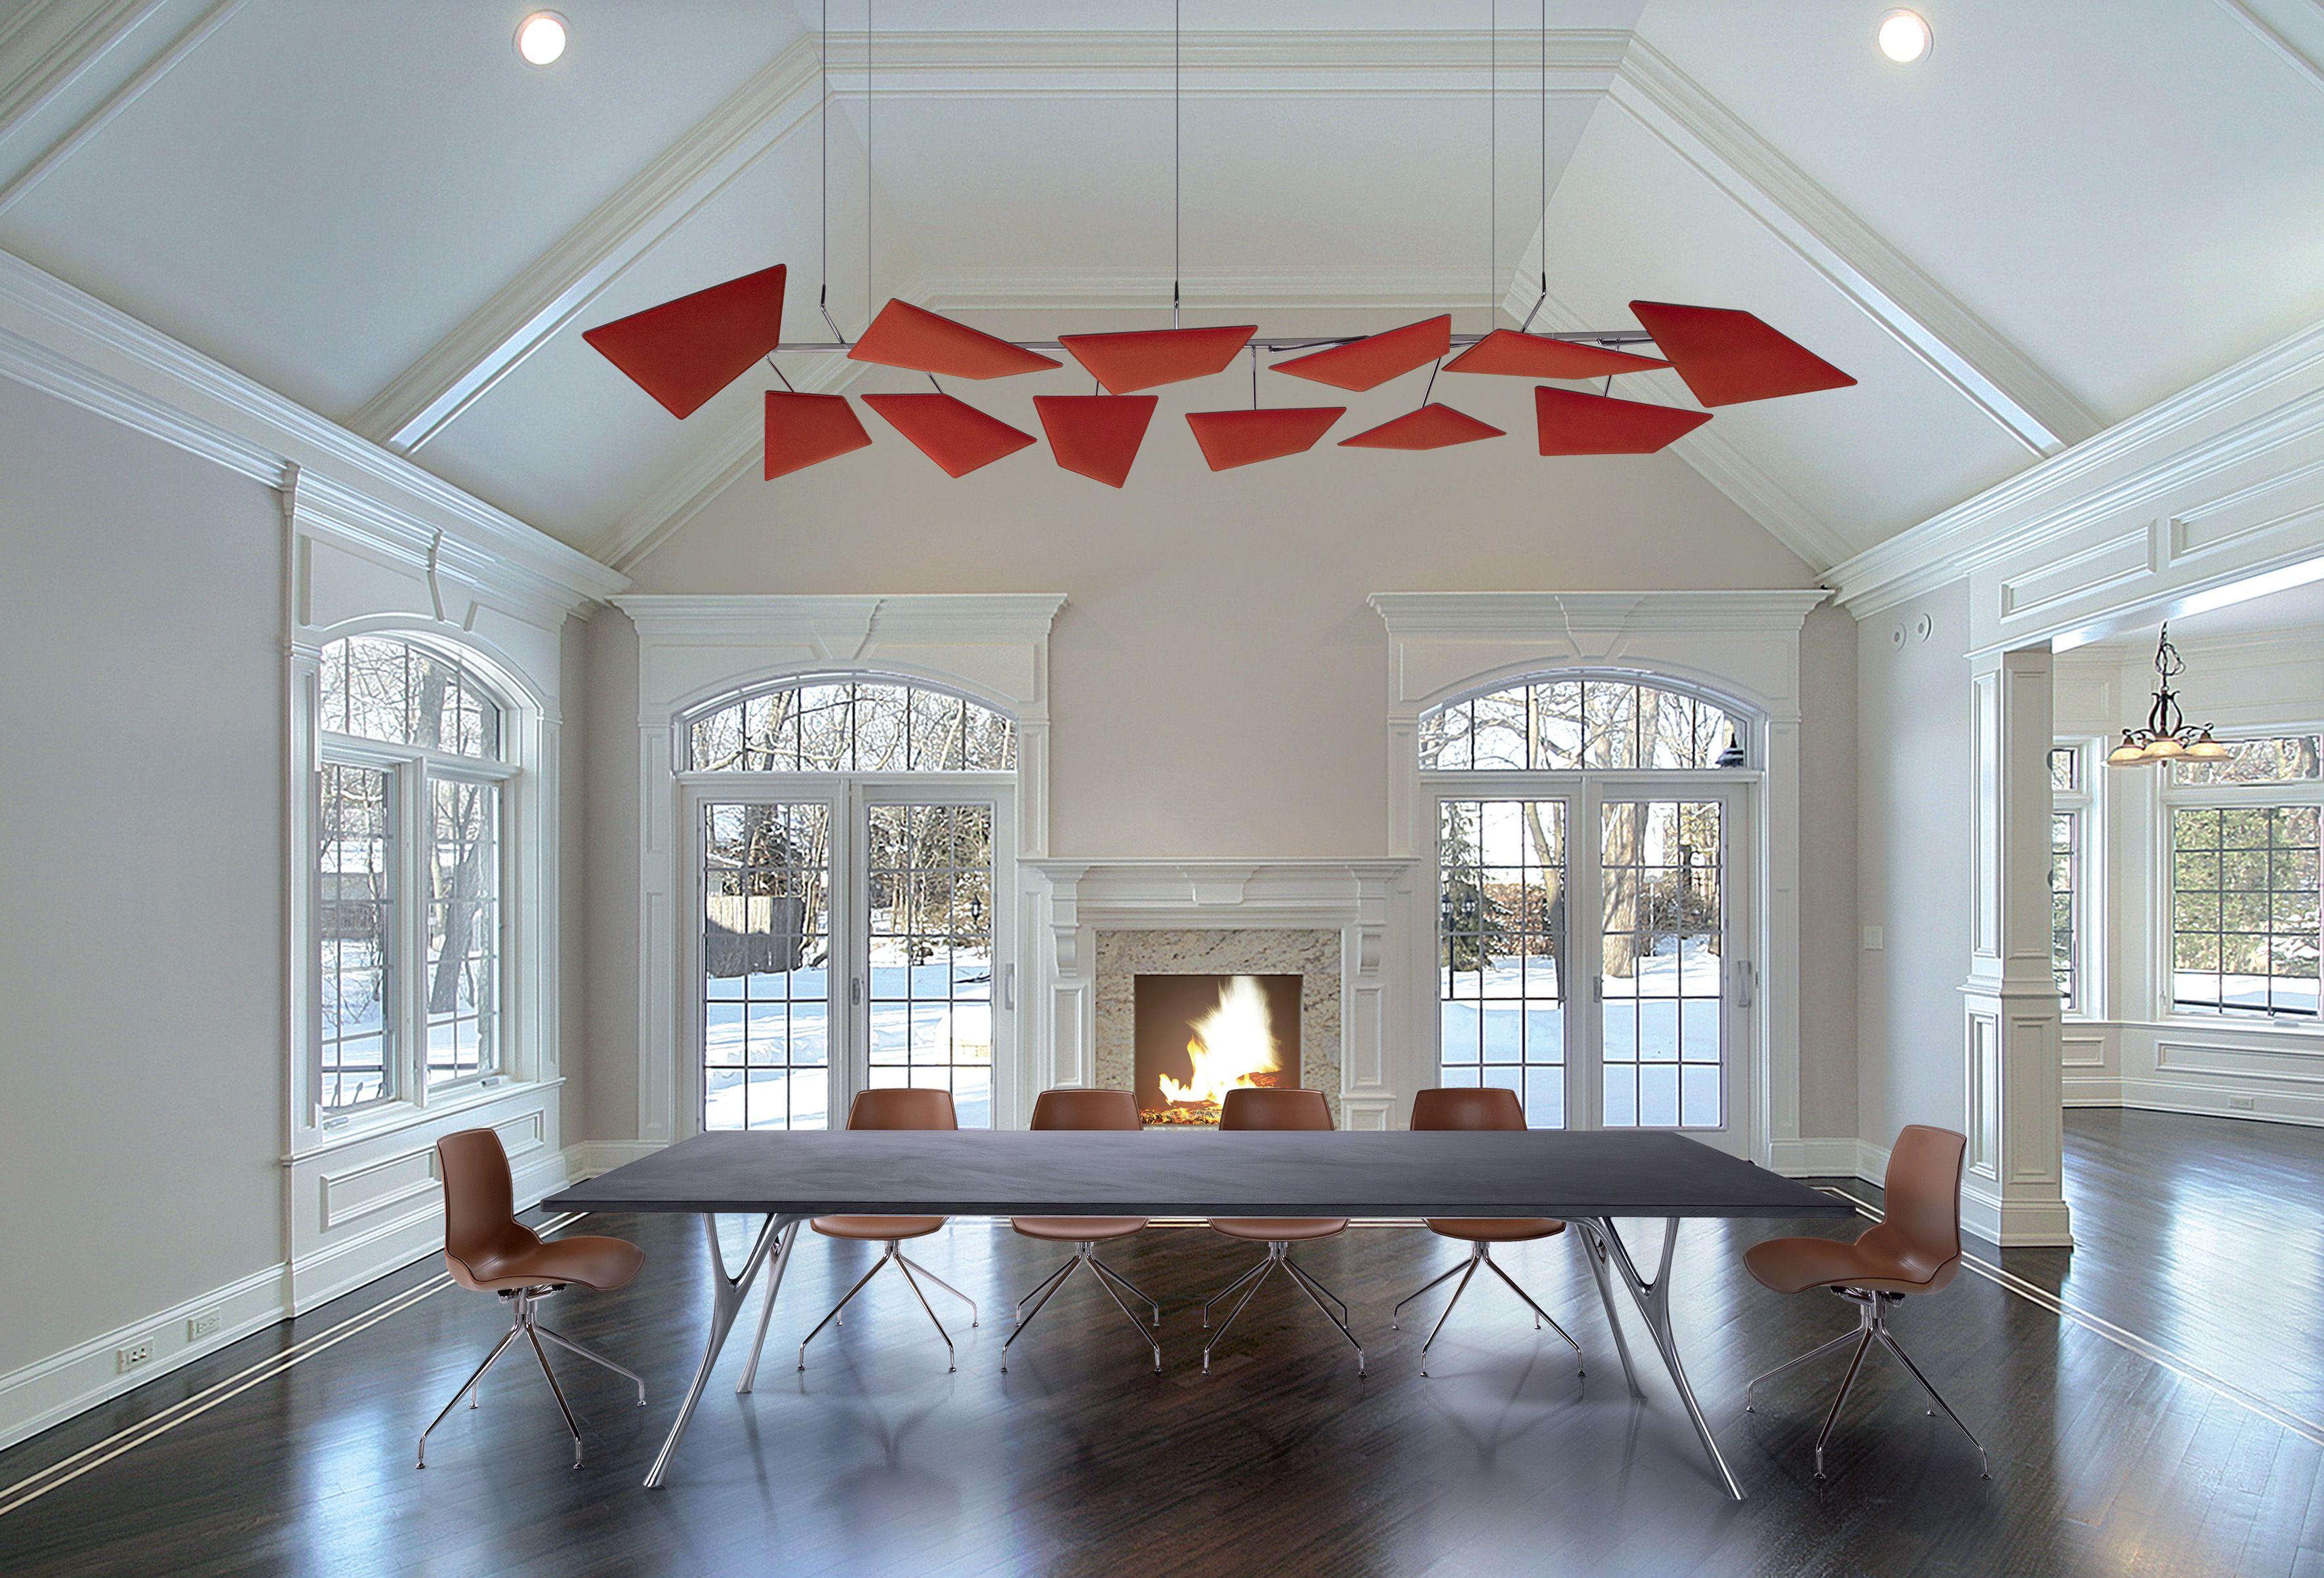 Caimi Brevetti S P A Catalogo Acoustic Panels Acoustic Ceiling Panels Interior